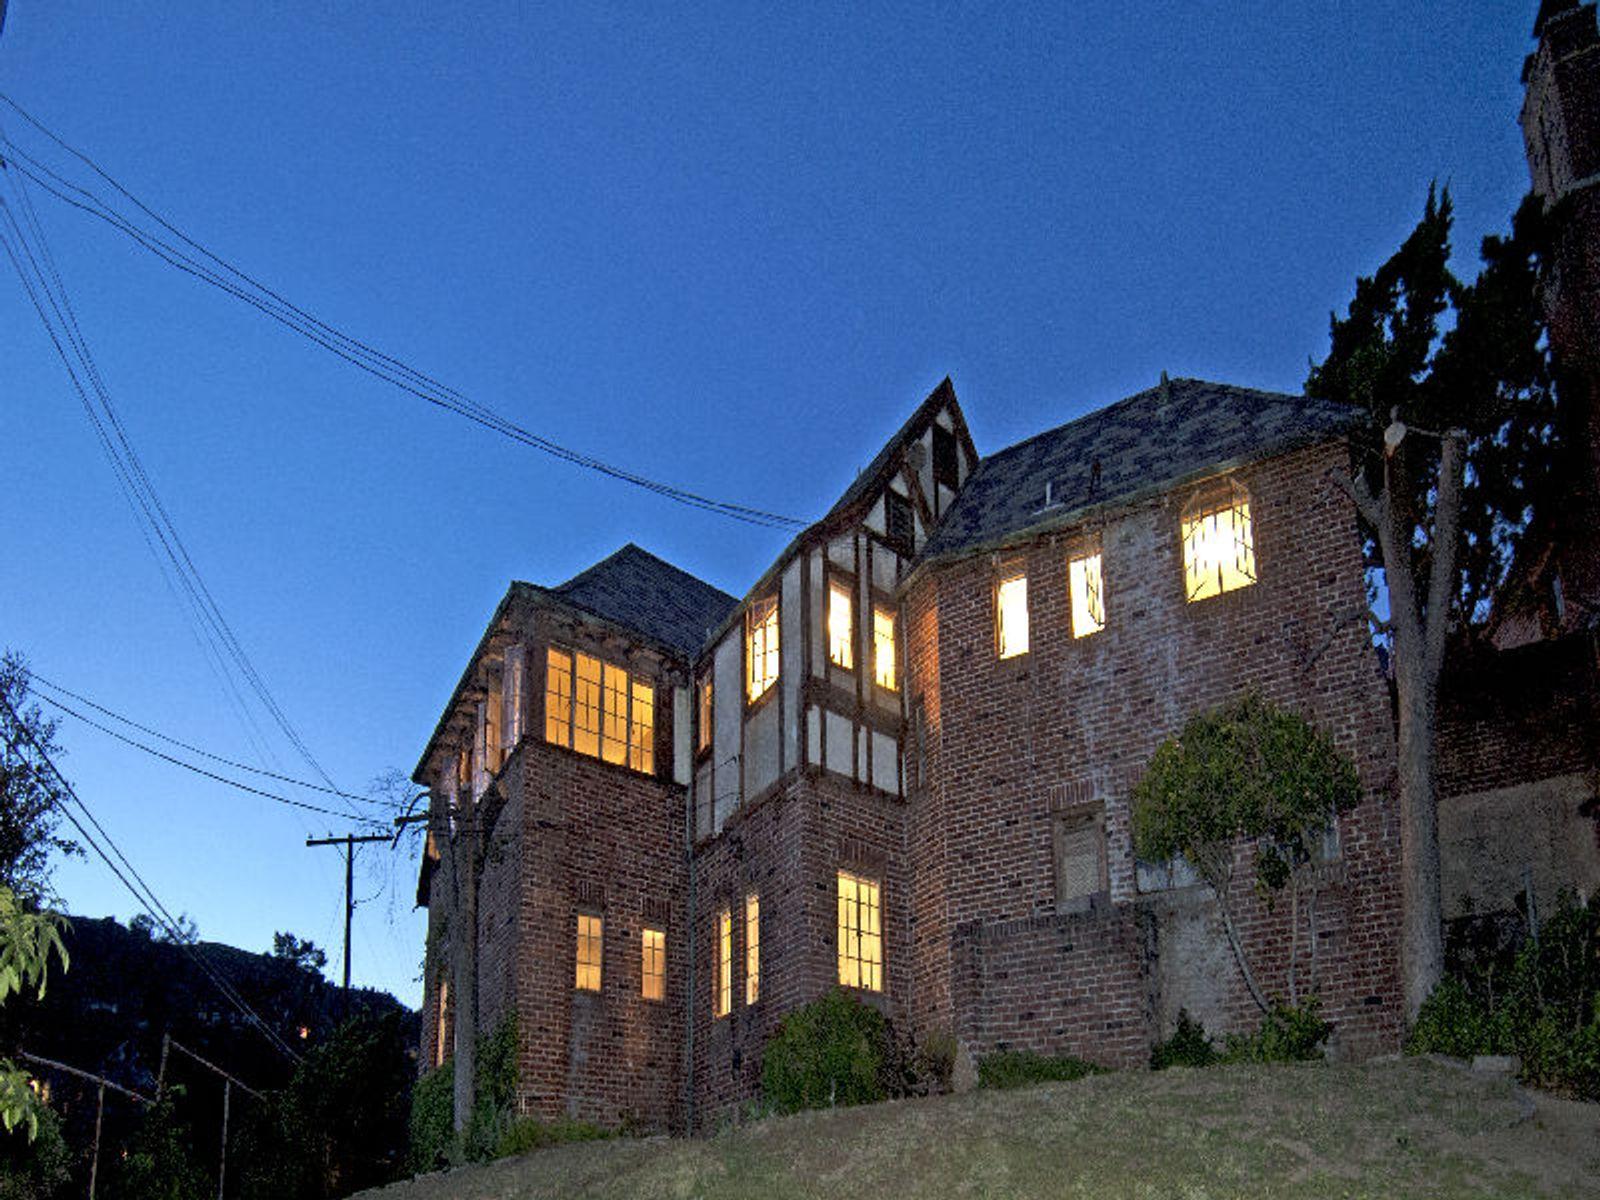 The Bela Lugosi Castle La Paloma